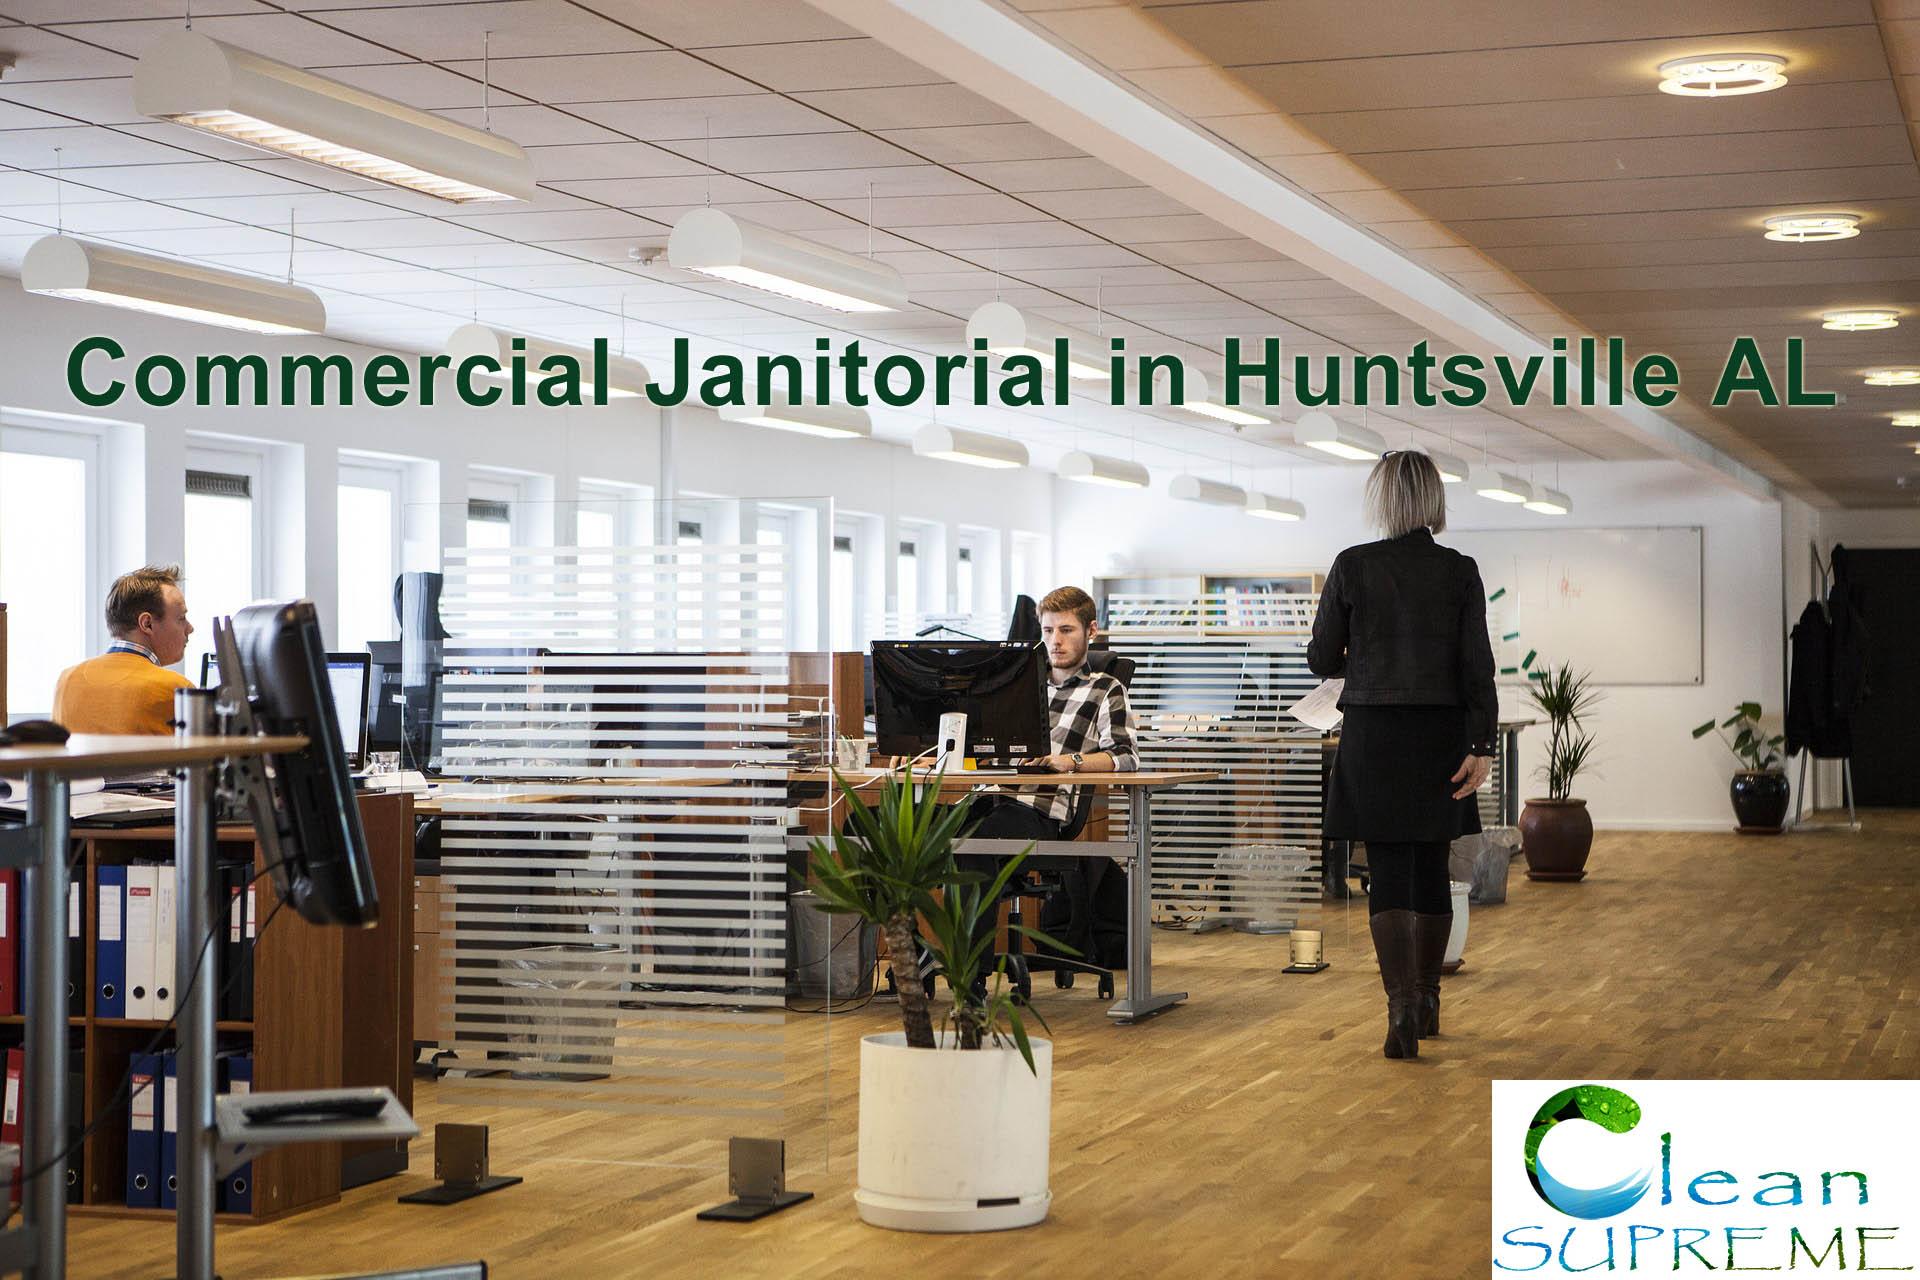 Commercial Janitorial in Huntsville AL